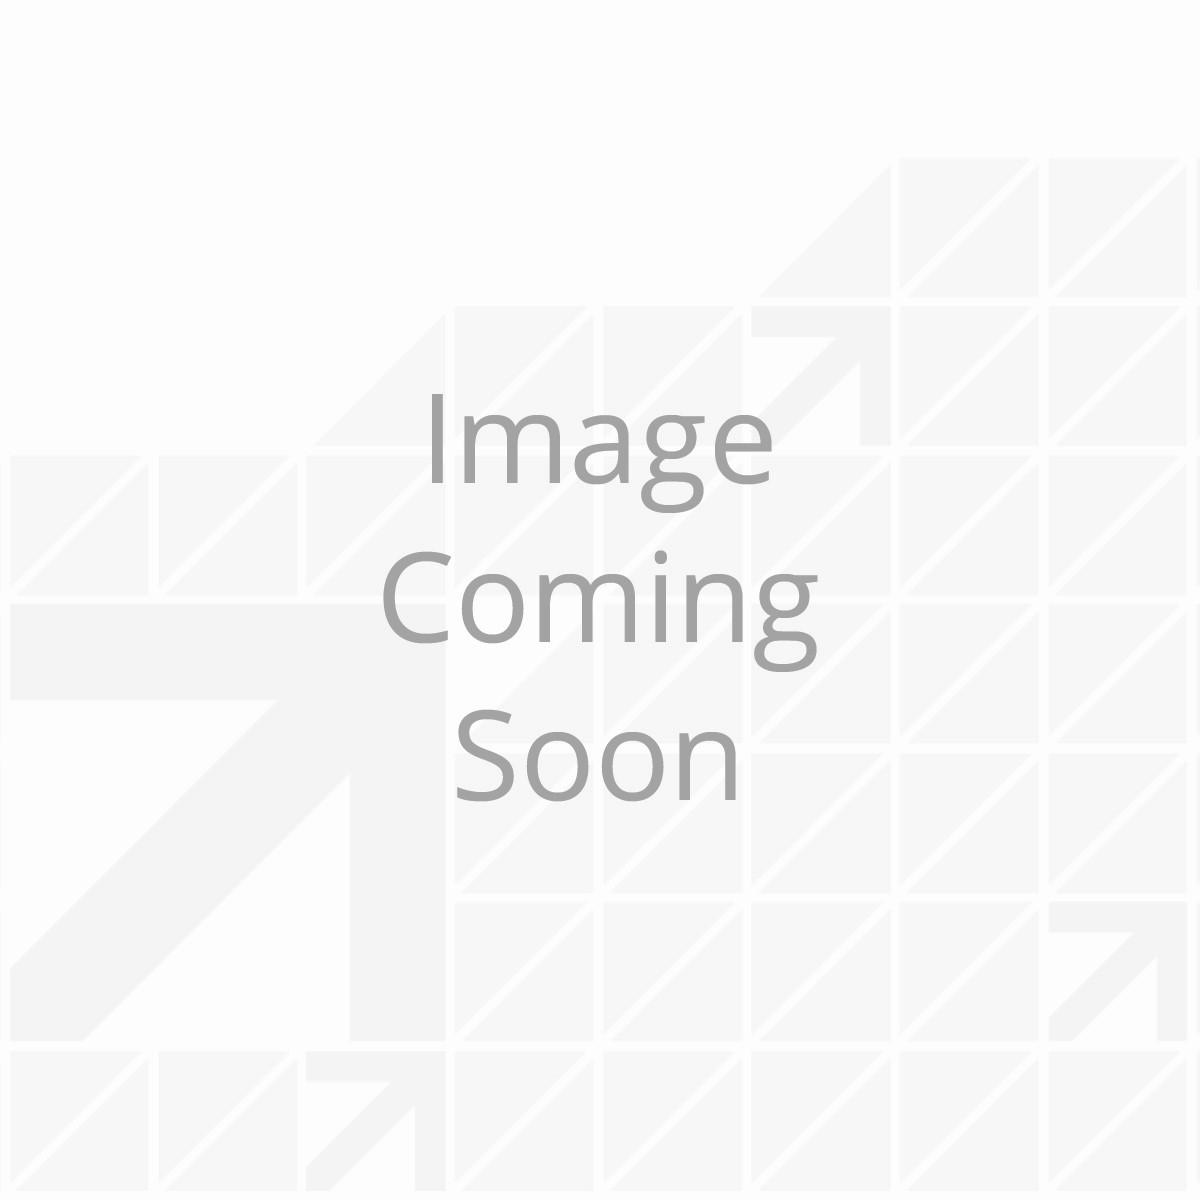 Triple Axle Configuration - Never Fail™ Shackle and Bolt Kit